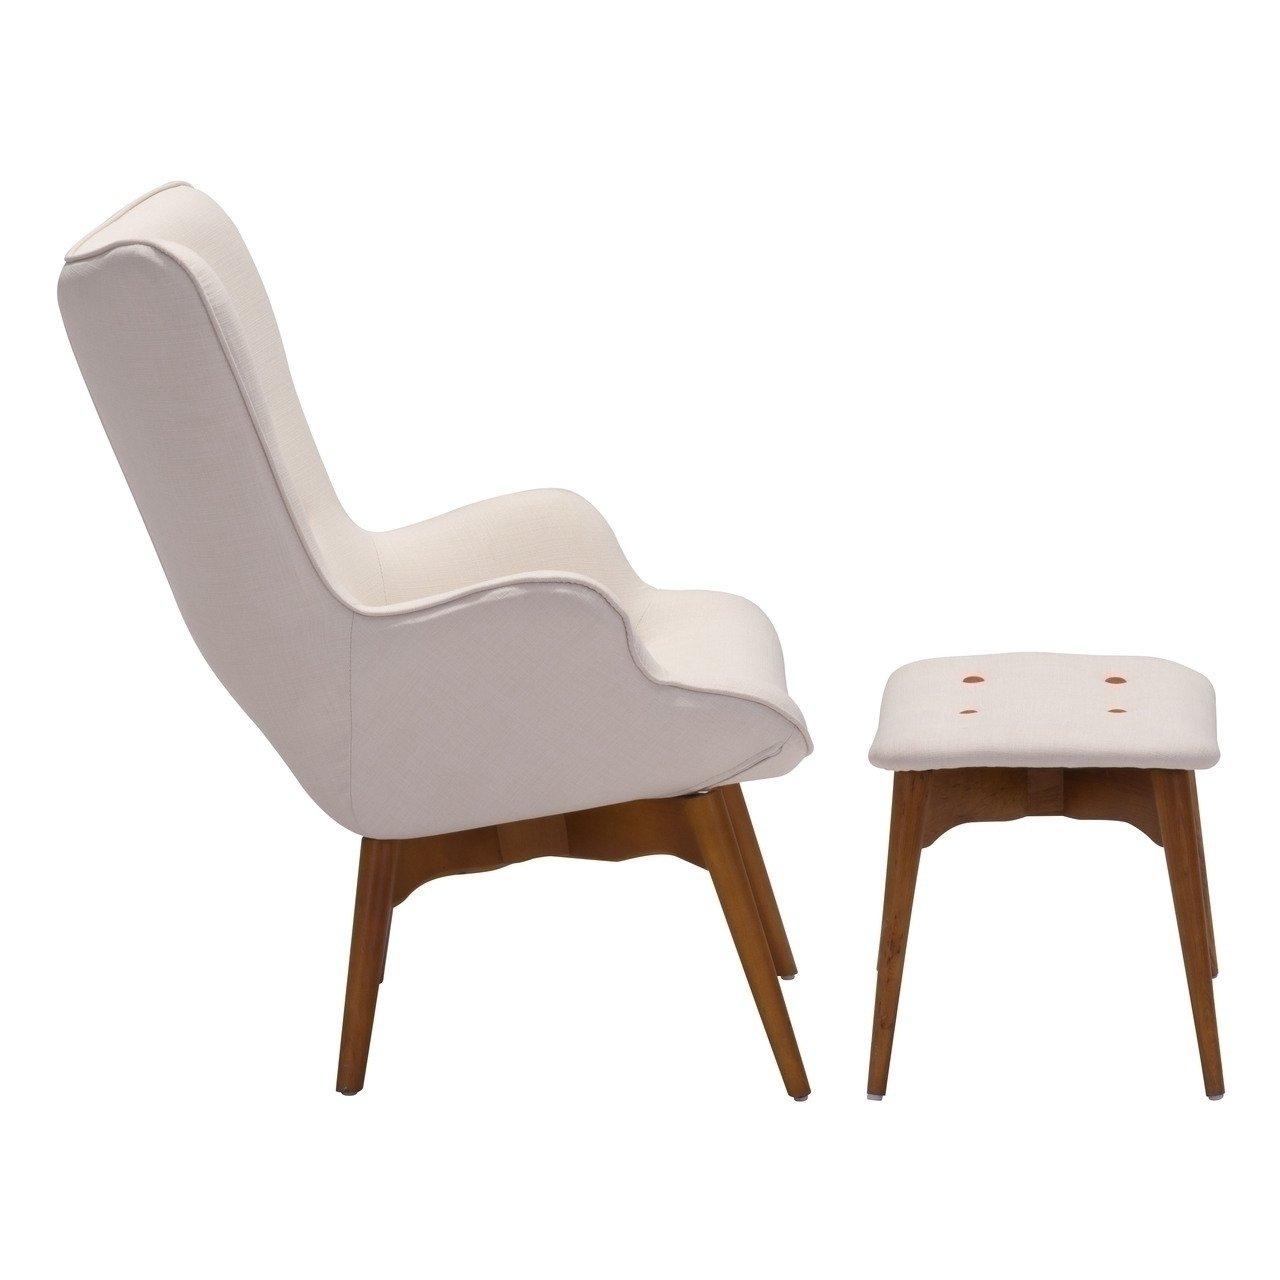 grant featherston chair & ottoman - cream